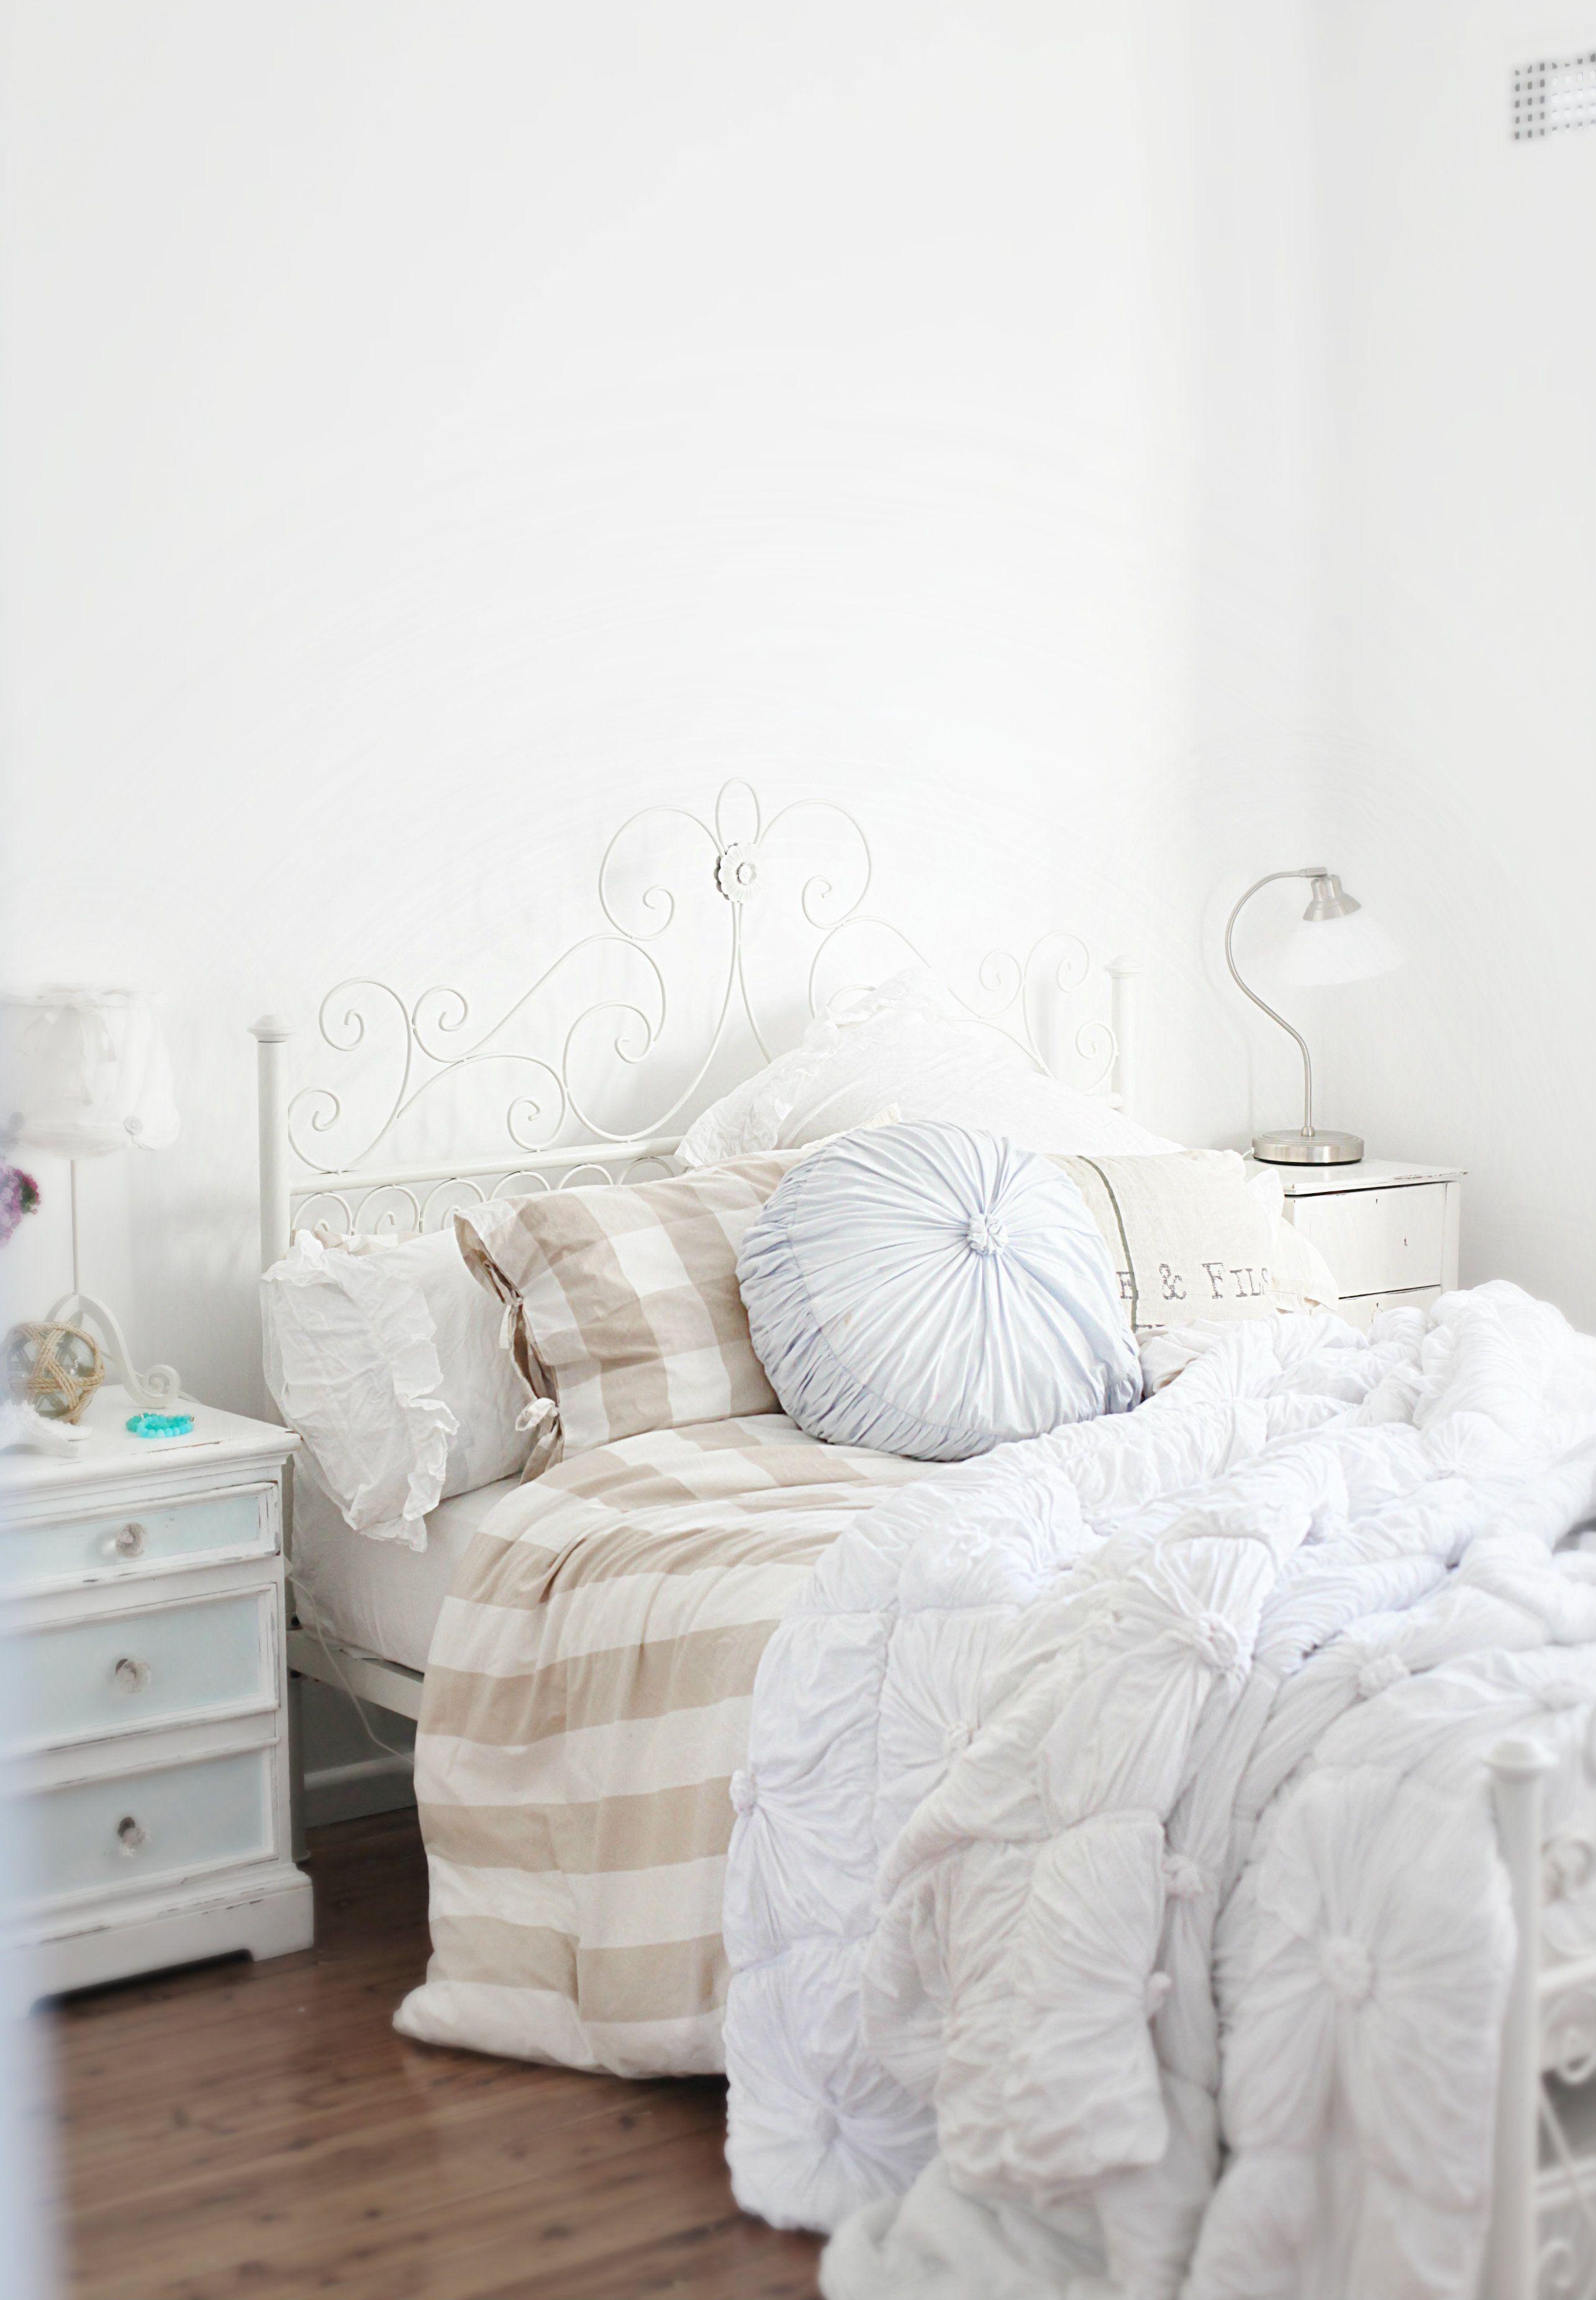 Beach Cottage Decor Ideas | Coastal style, Comforter and ...